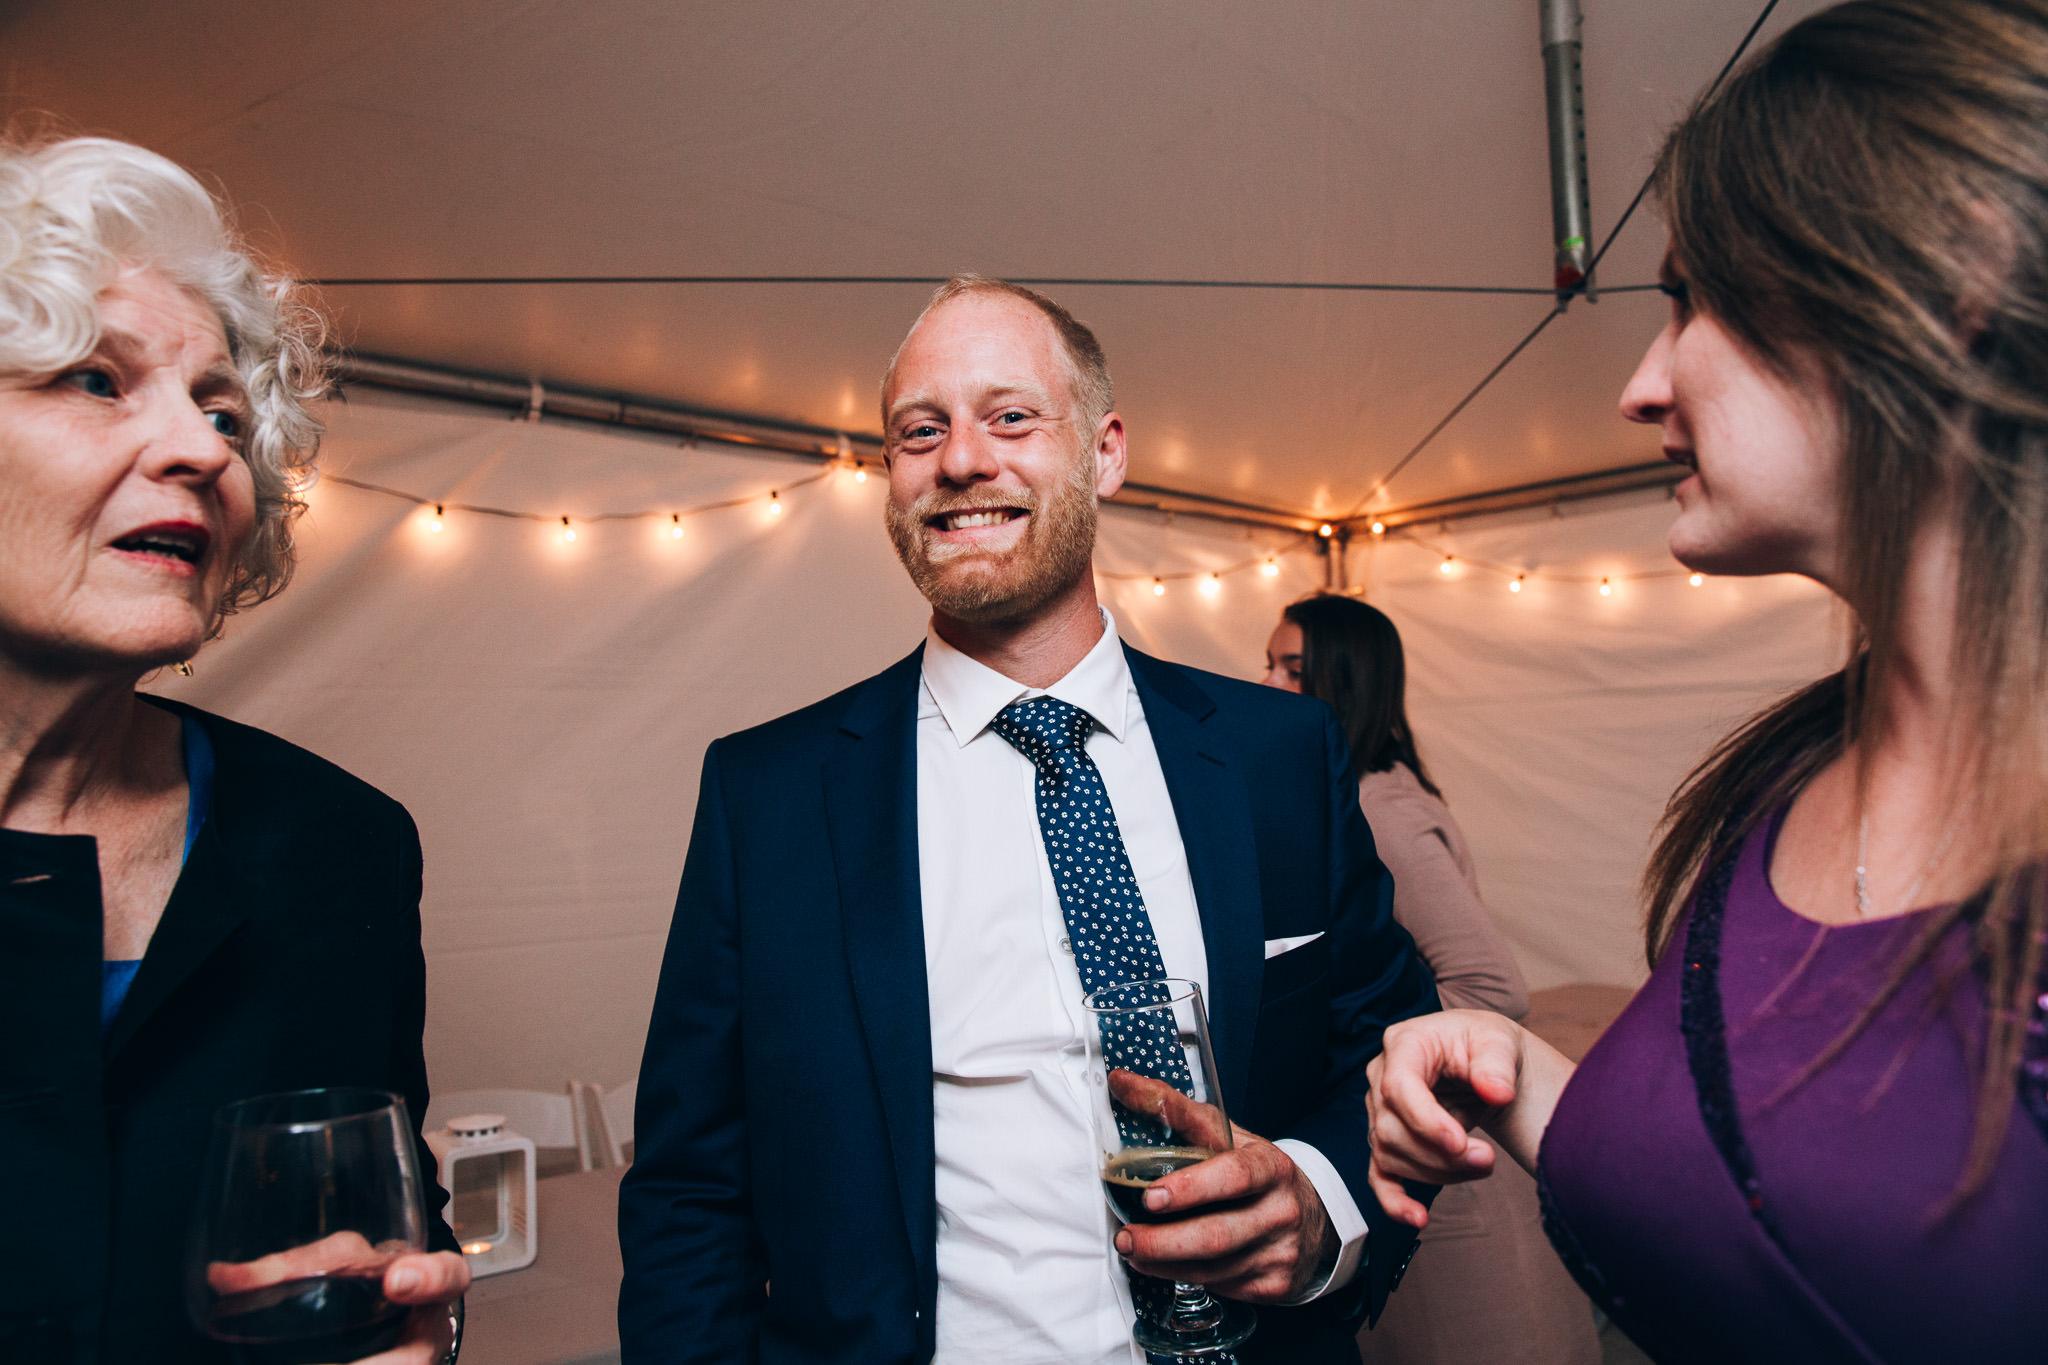 078_Canada-documentary-wedding-photograp